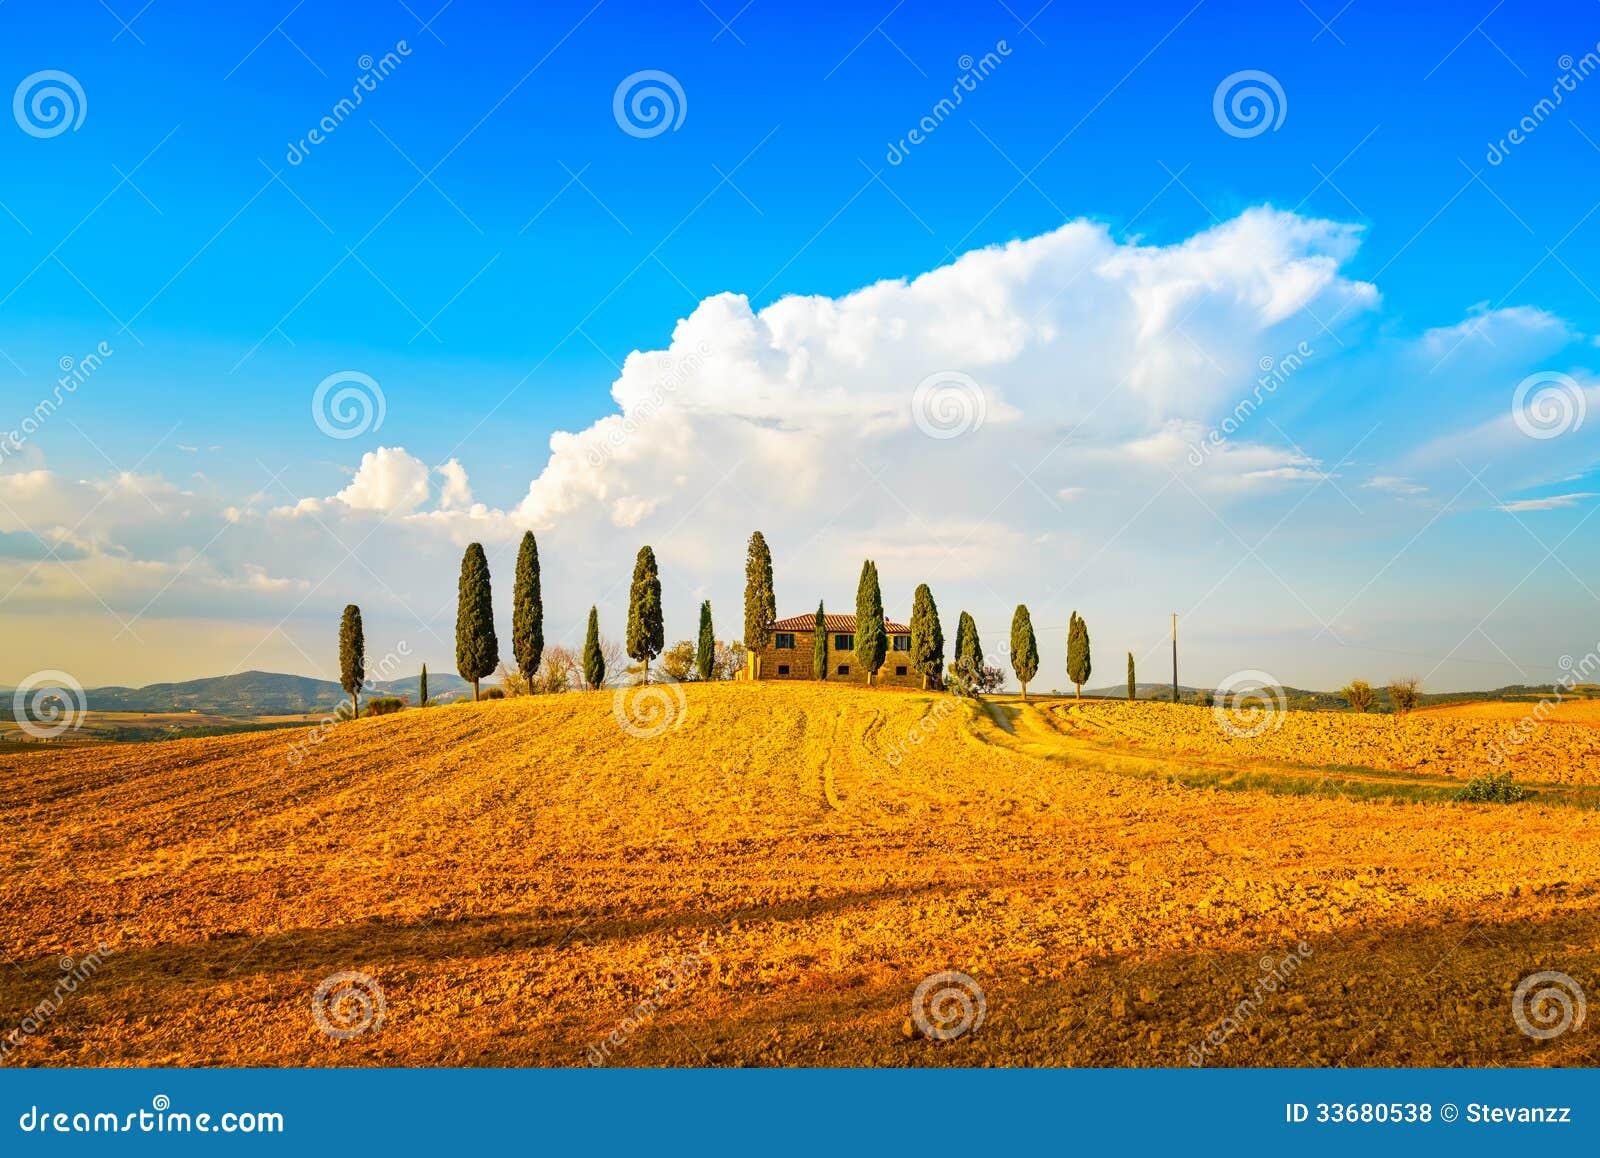 Toscanië, landbouwgrond, cipresbomen en witte weg. Siena, Val D of